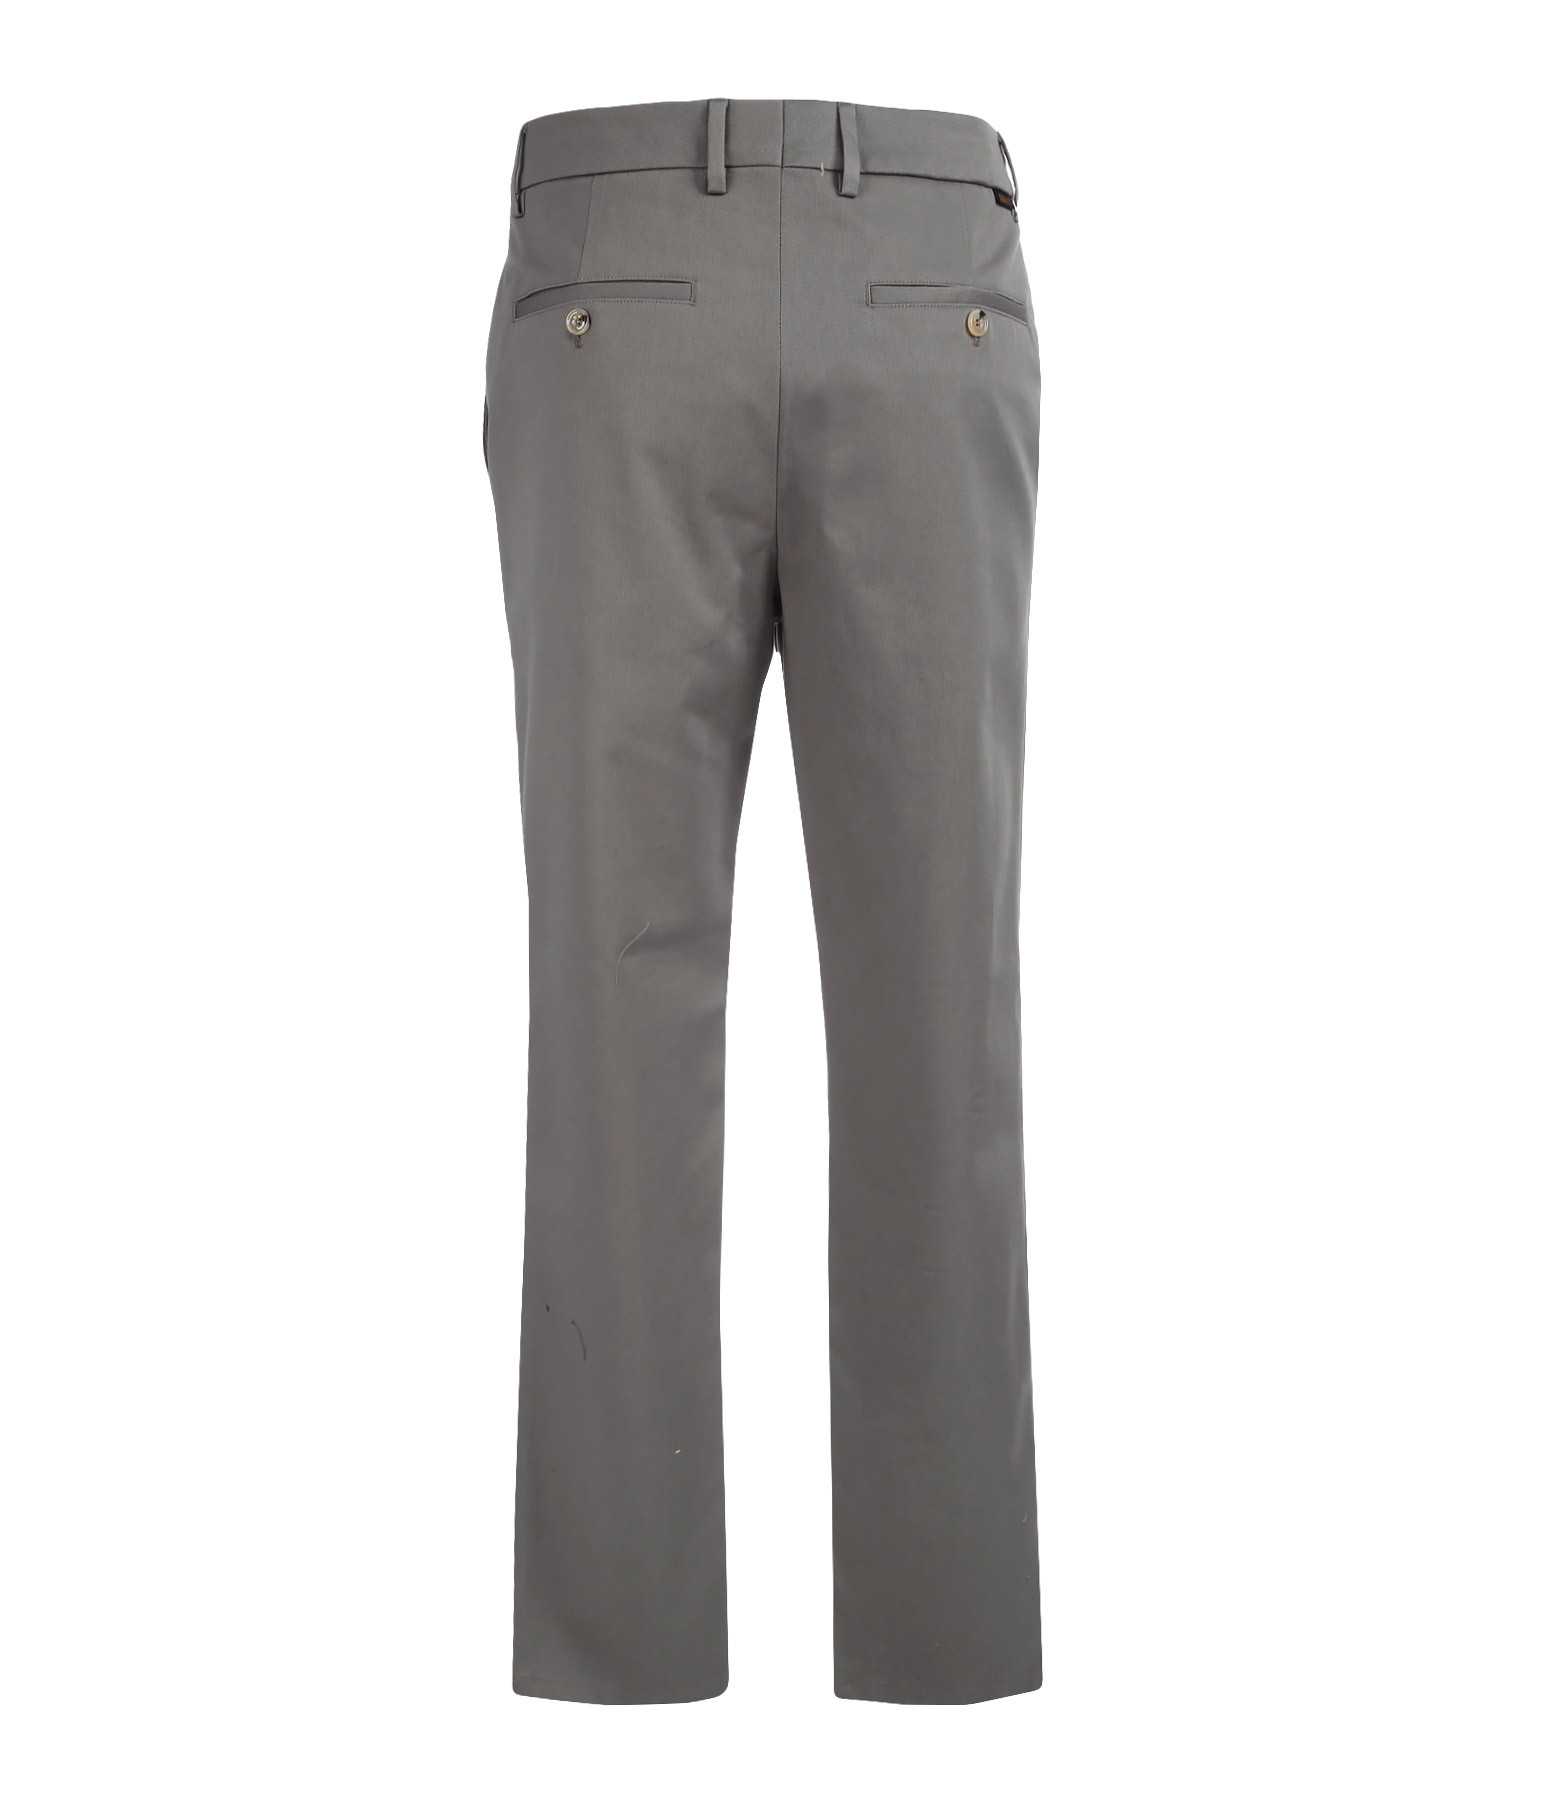 pantalon chino homme coton gris golden goose. Black Bedroom Furniture Sets. Home Design Ideas